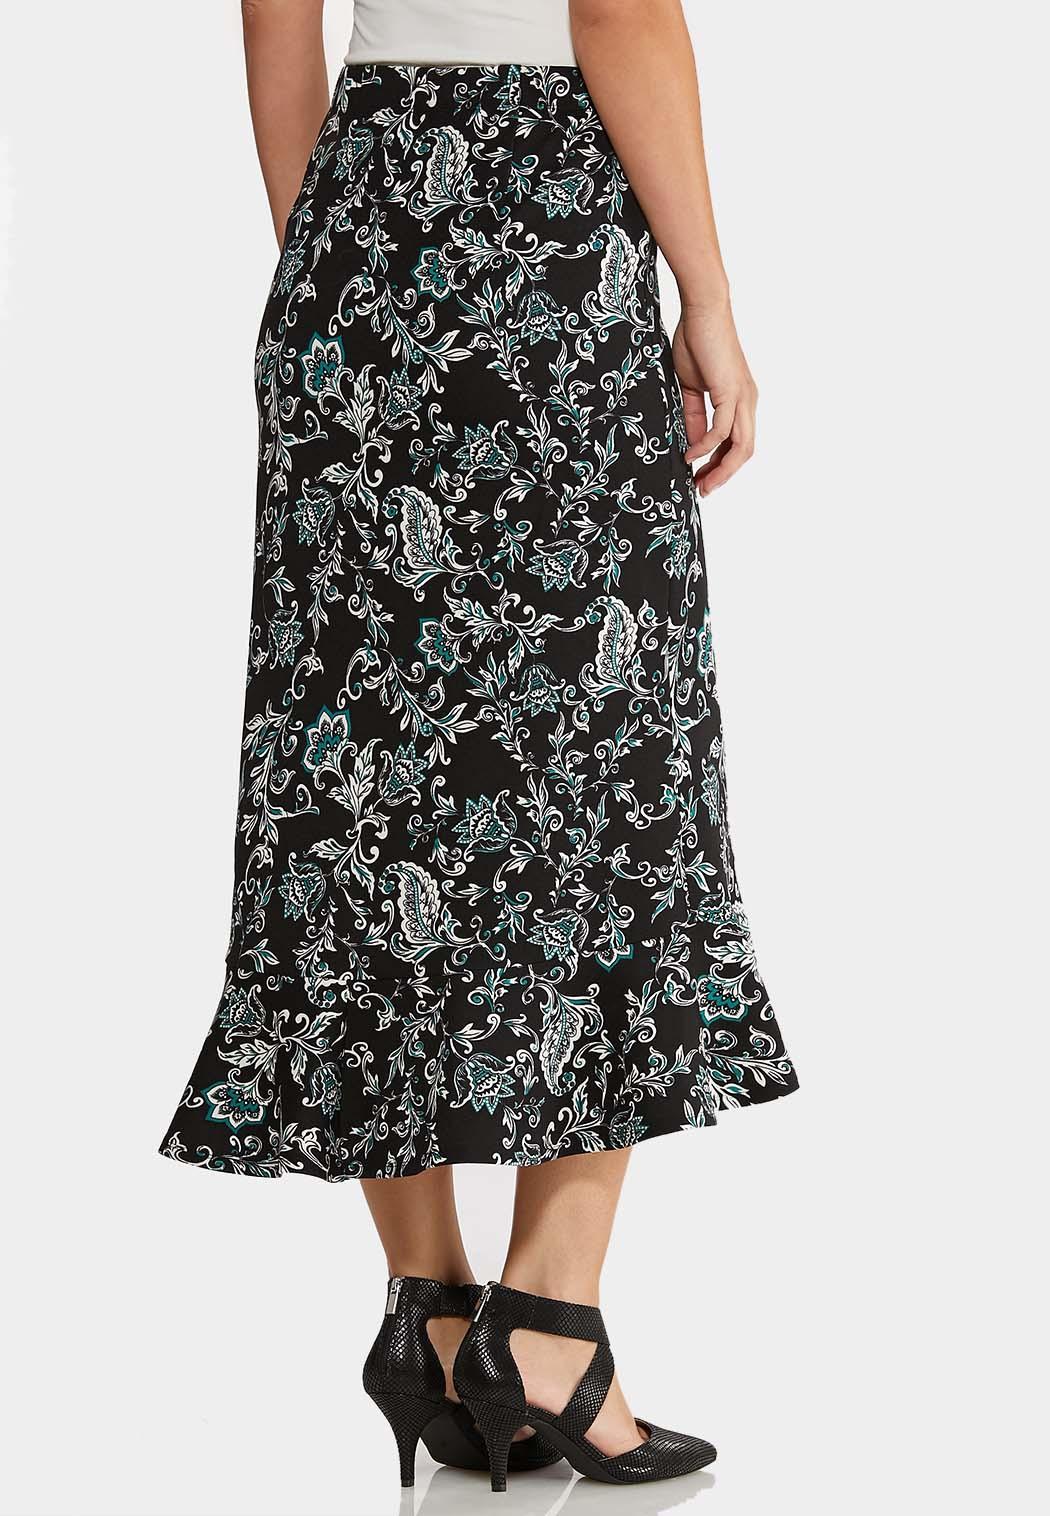 Plus Size Flounced Midi Skirt (Item #43955918)